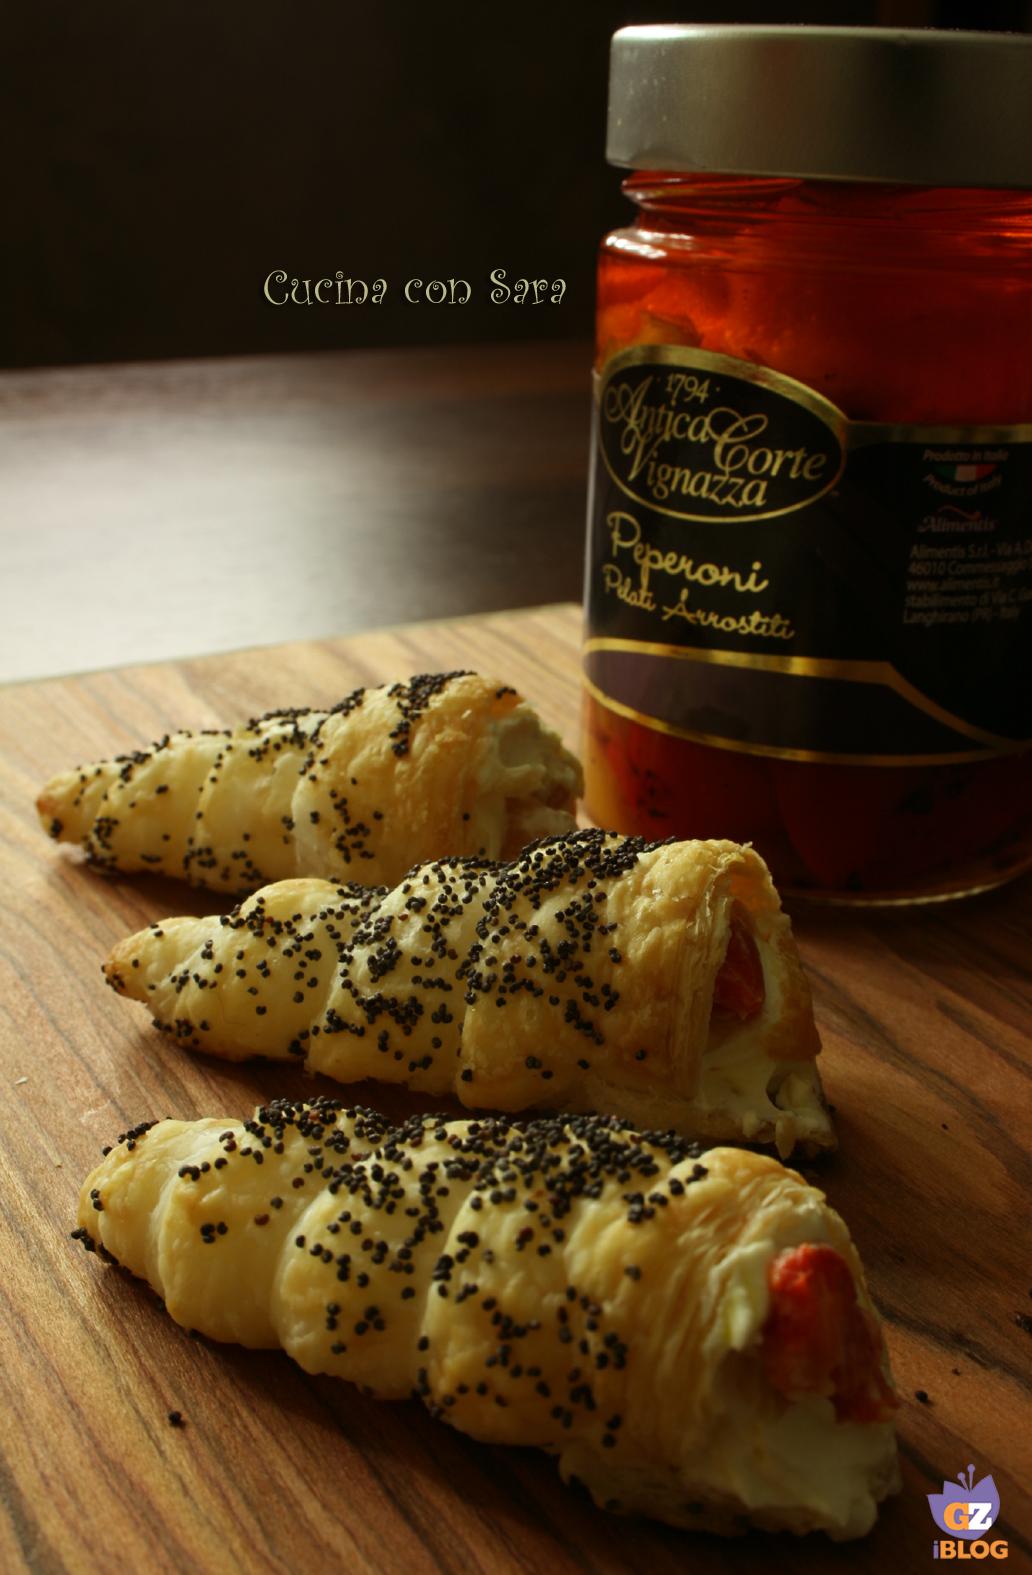 Cannoncini salati ricotta e peperoni, cucina con sara